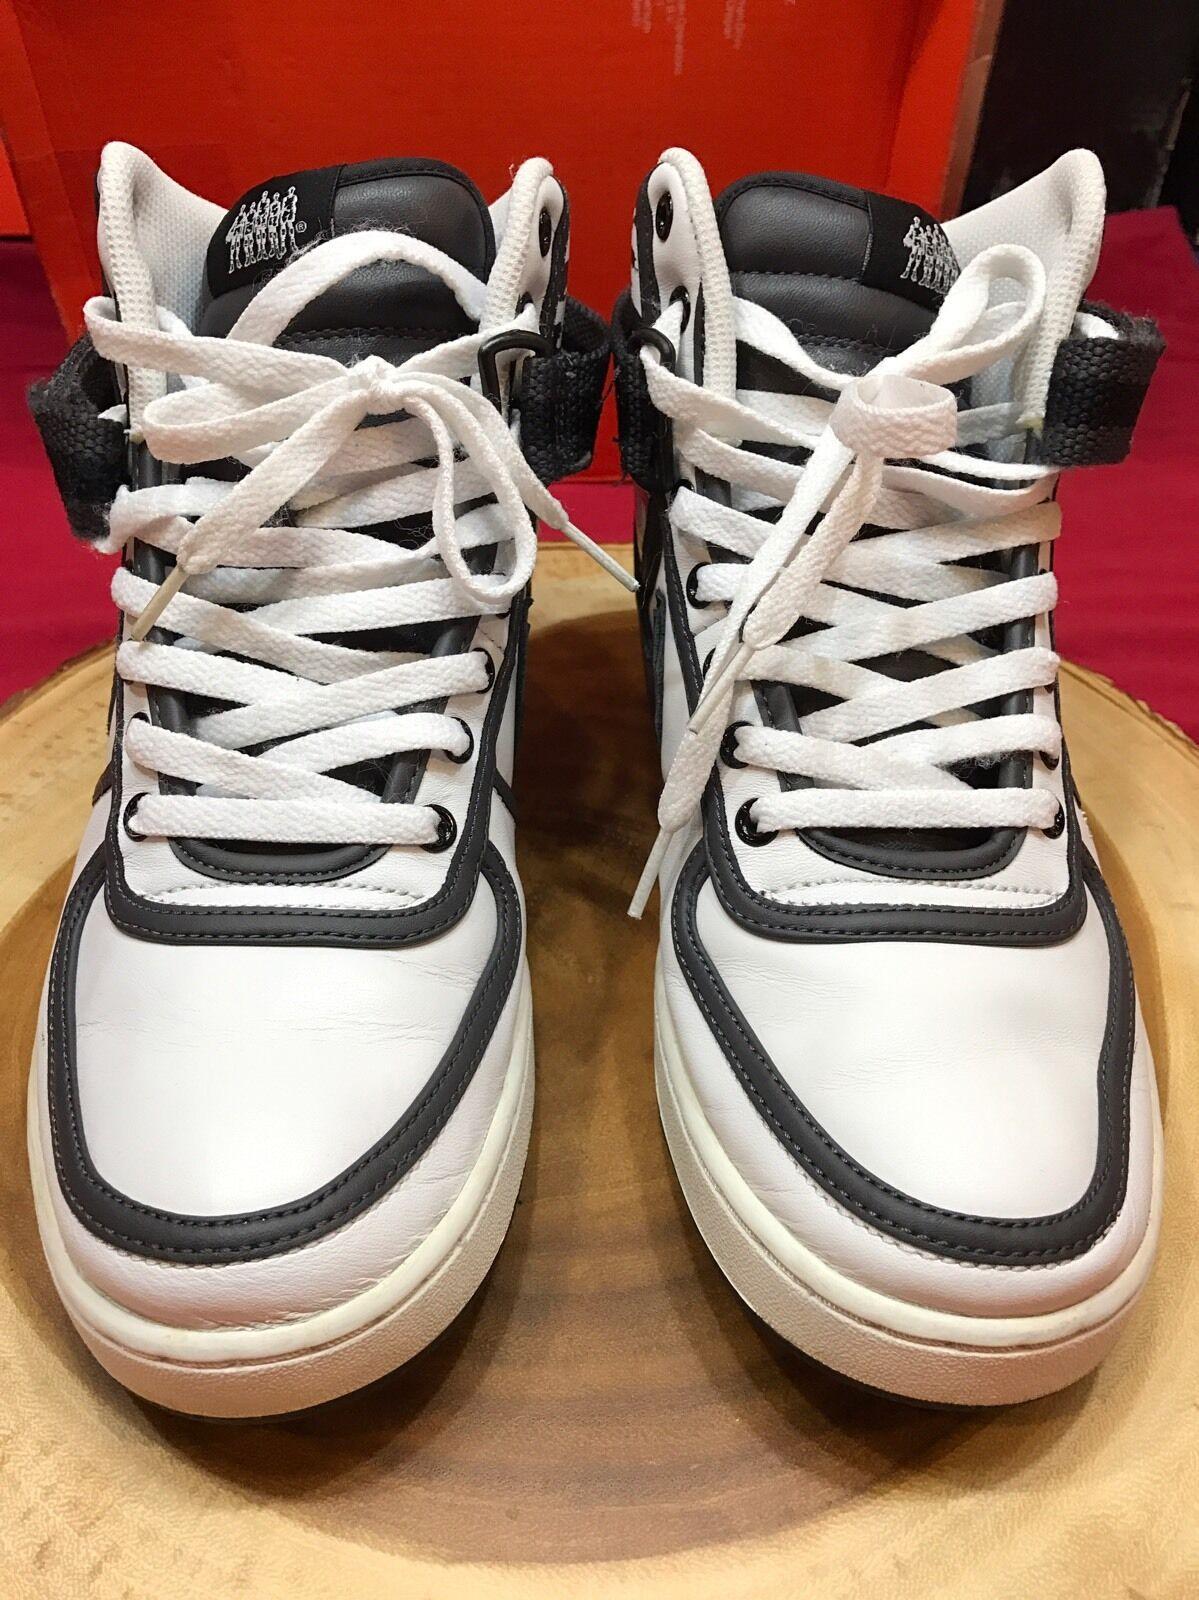 separation shoes c1ea0 75dad ... Nike Vandal Vandal Vandal High Black White Size 9.5 Philadelphia Philly  Panthers Jordan BFIVE 501dc8 ...